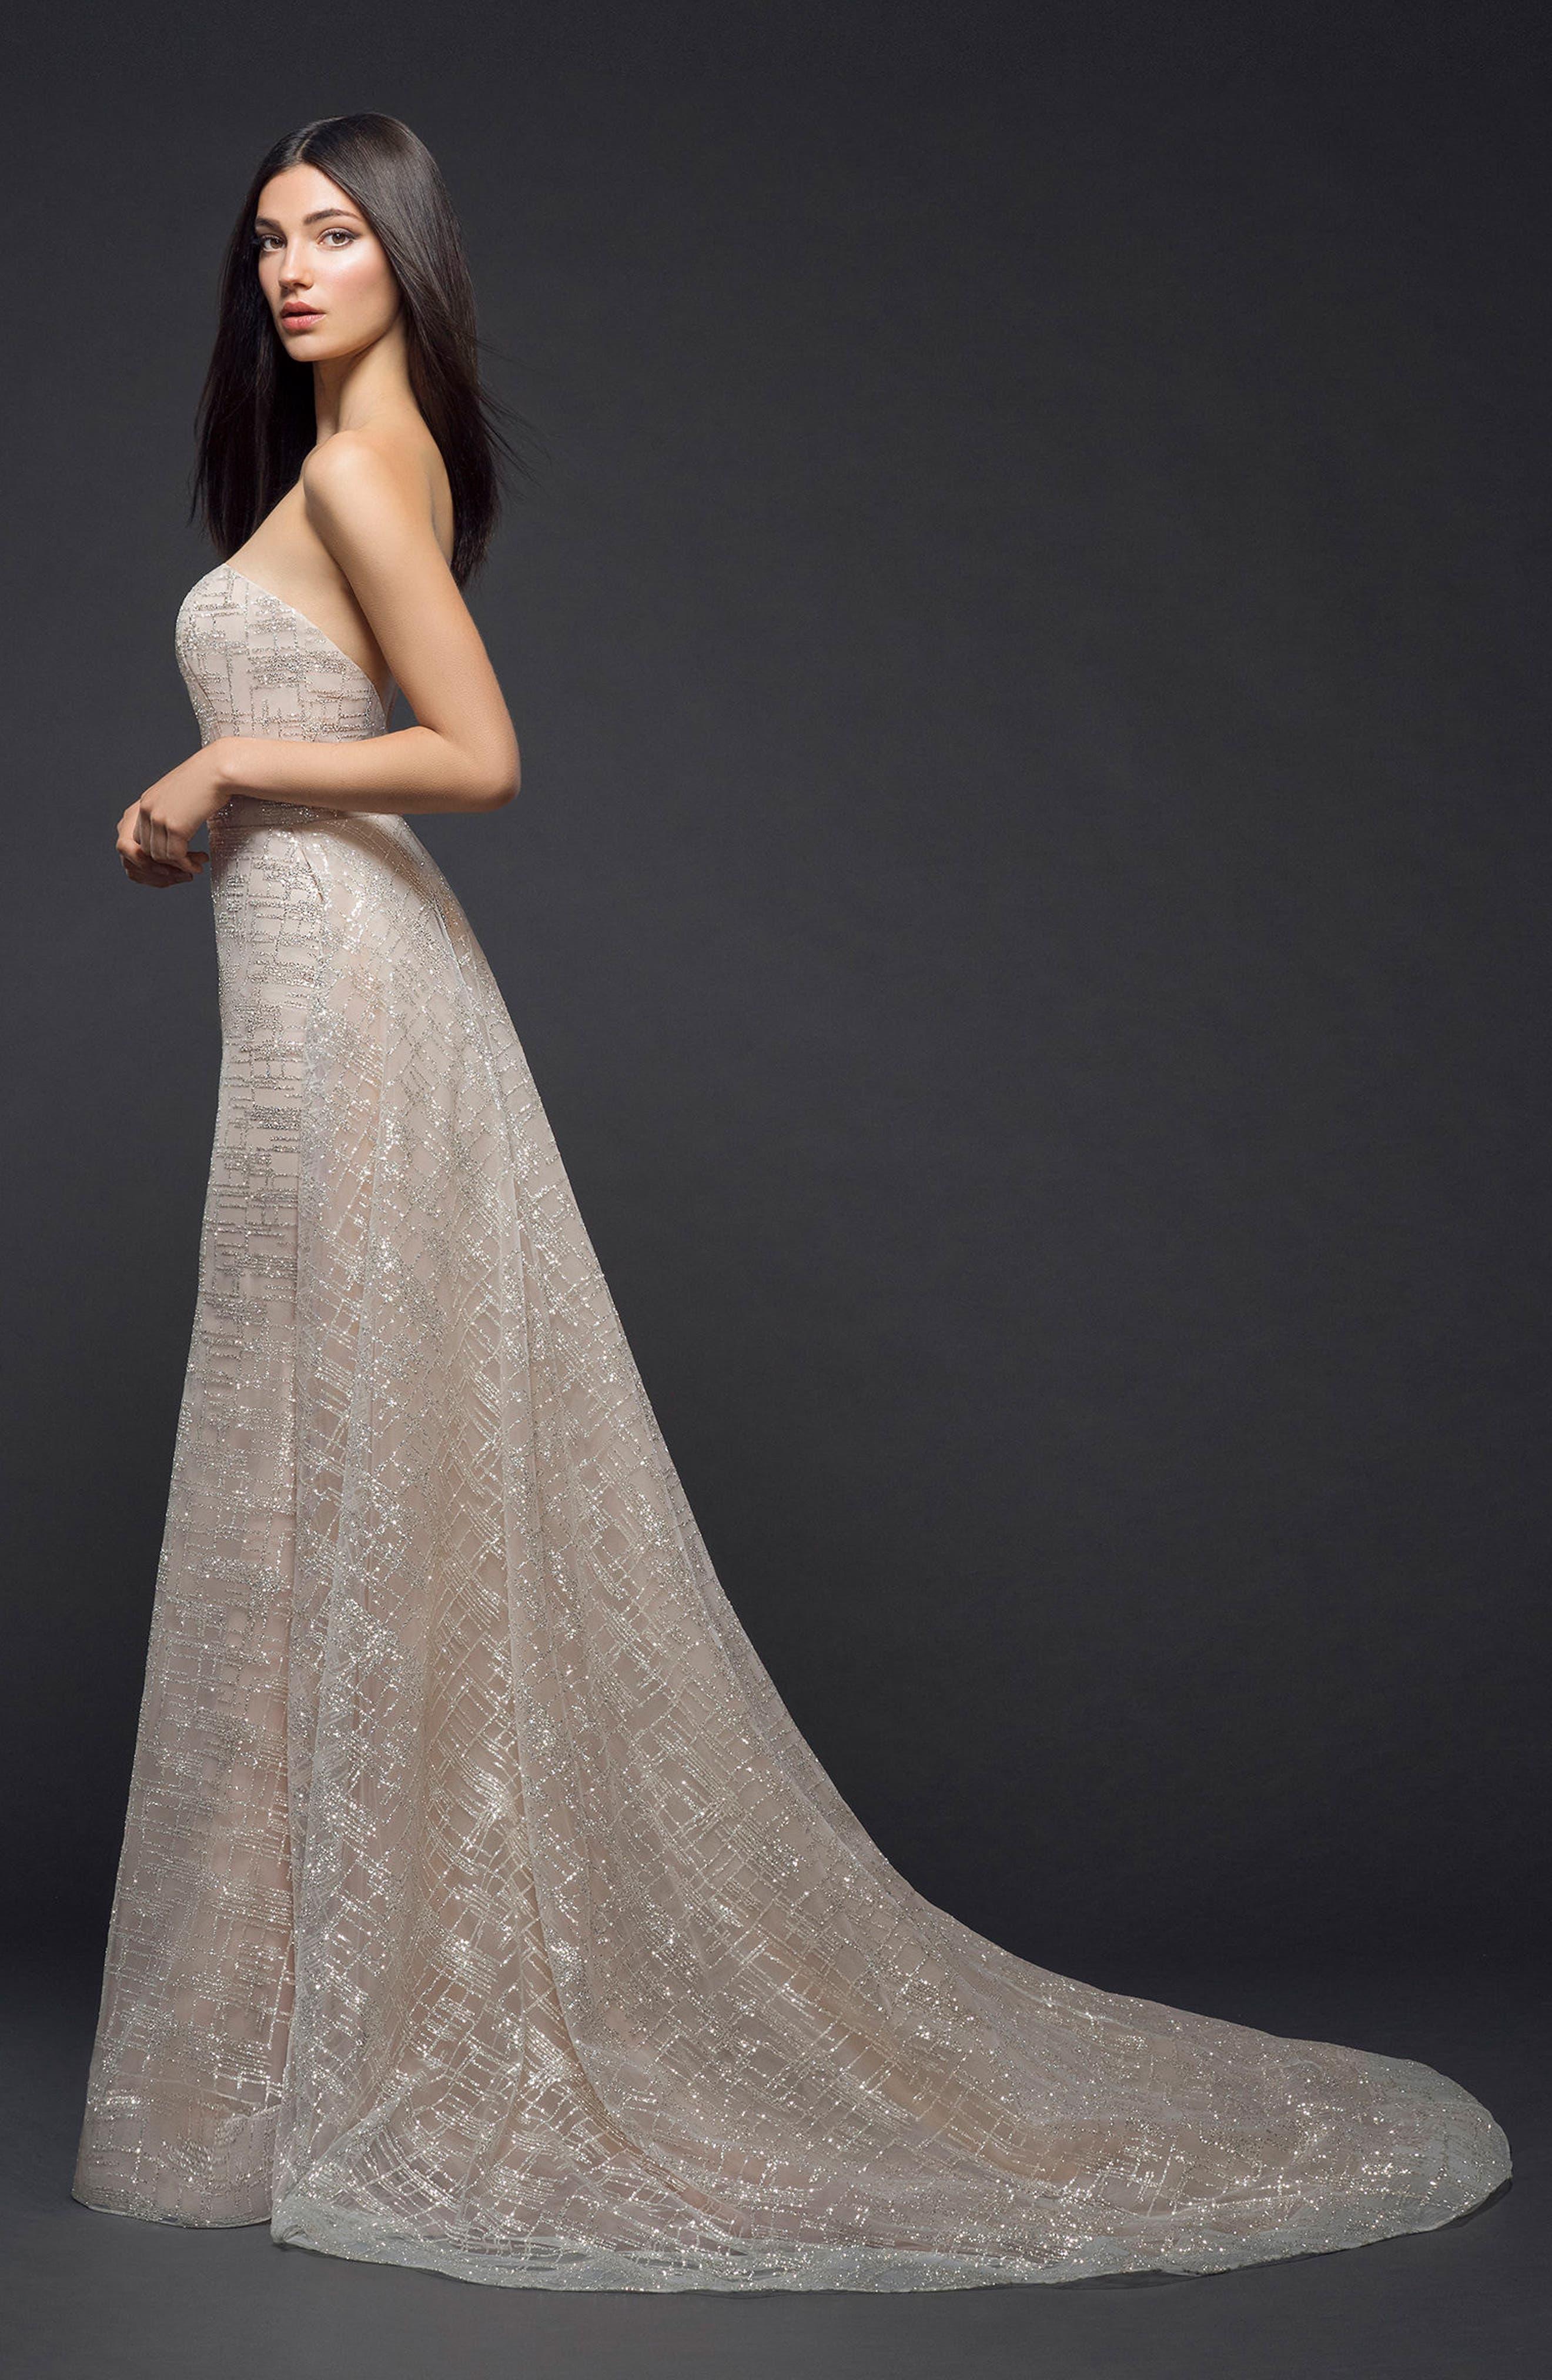 Sparkle Plaid Strapless Gown,                             Alternate thumbnail 2, color,                             NUDE